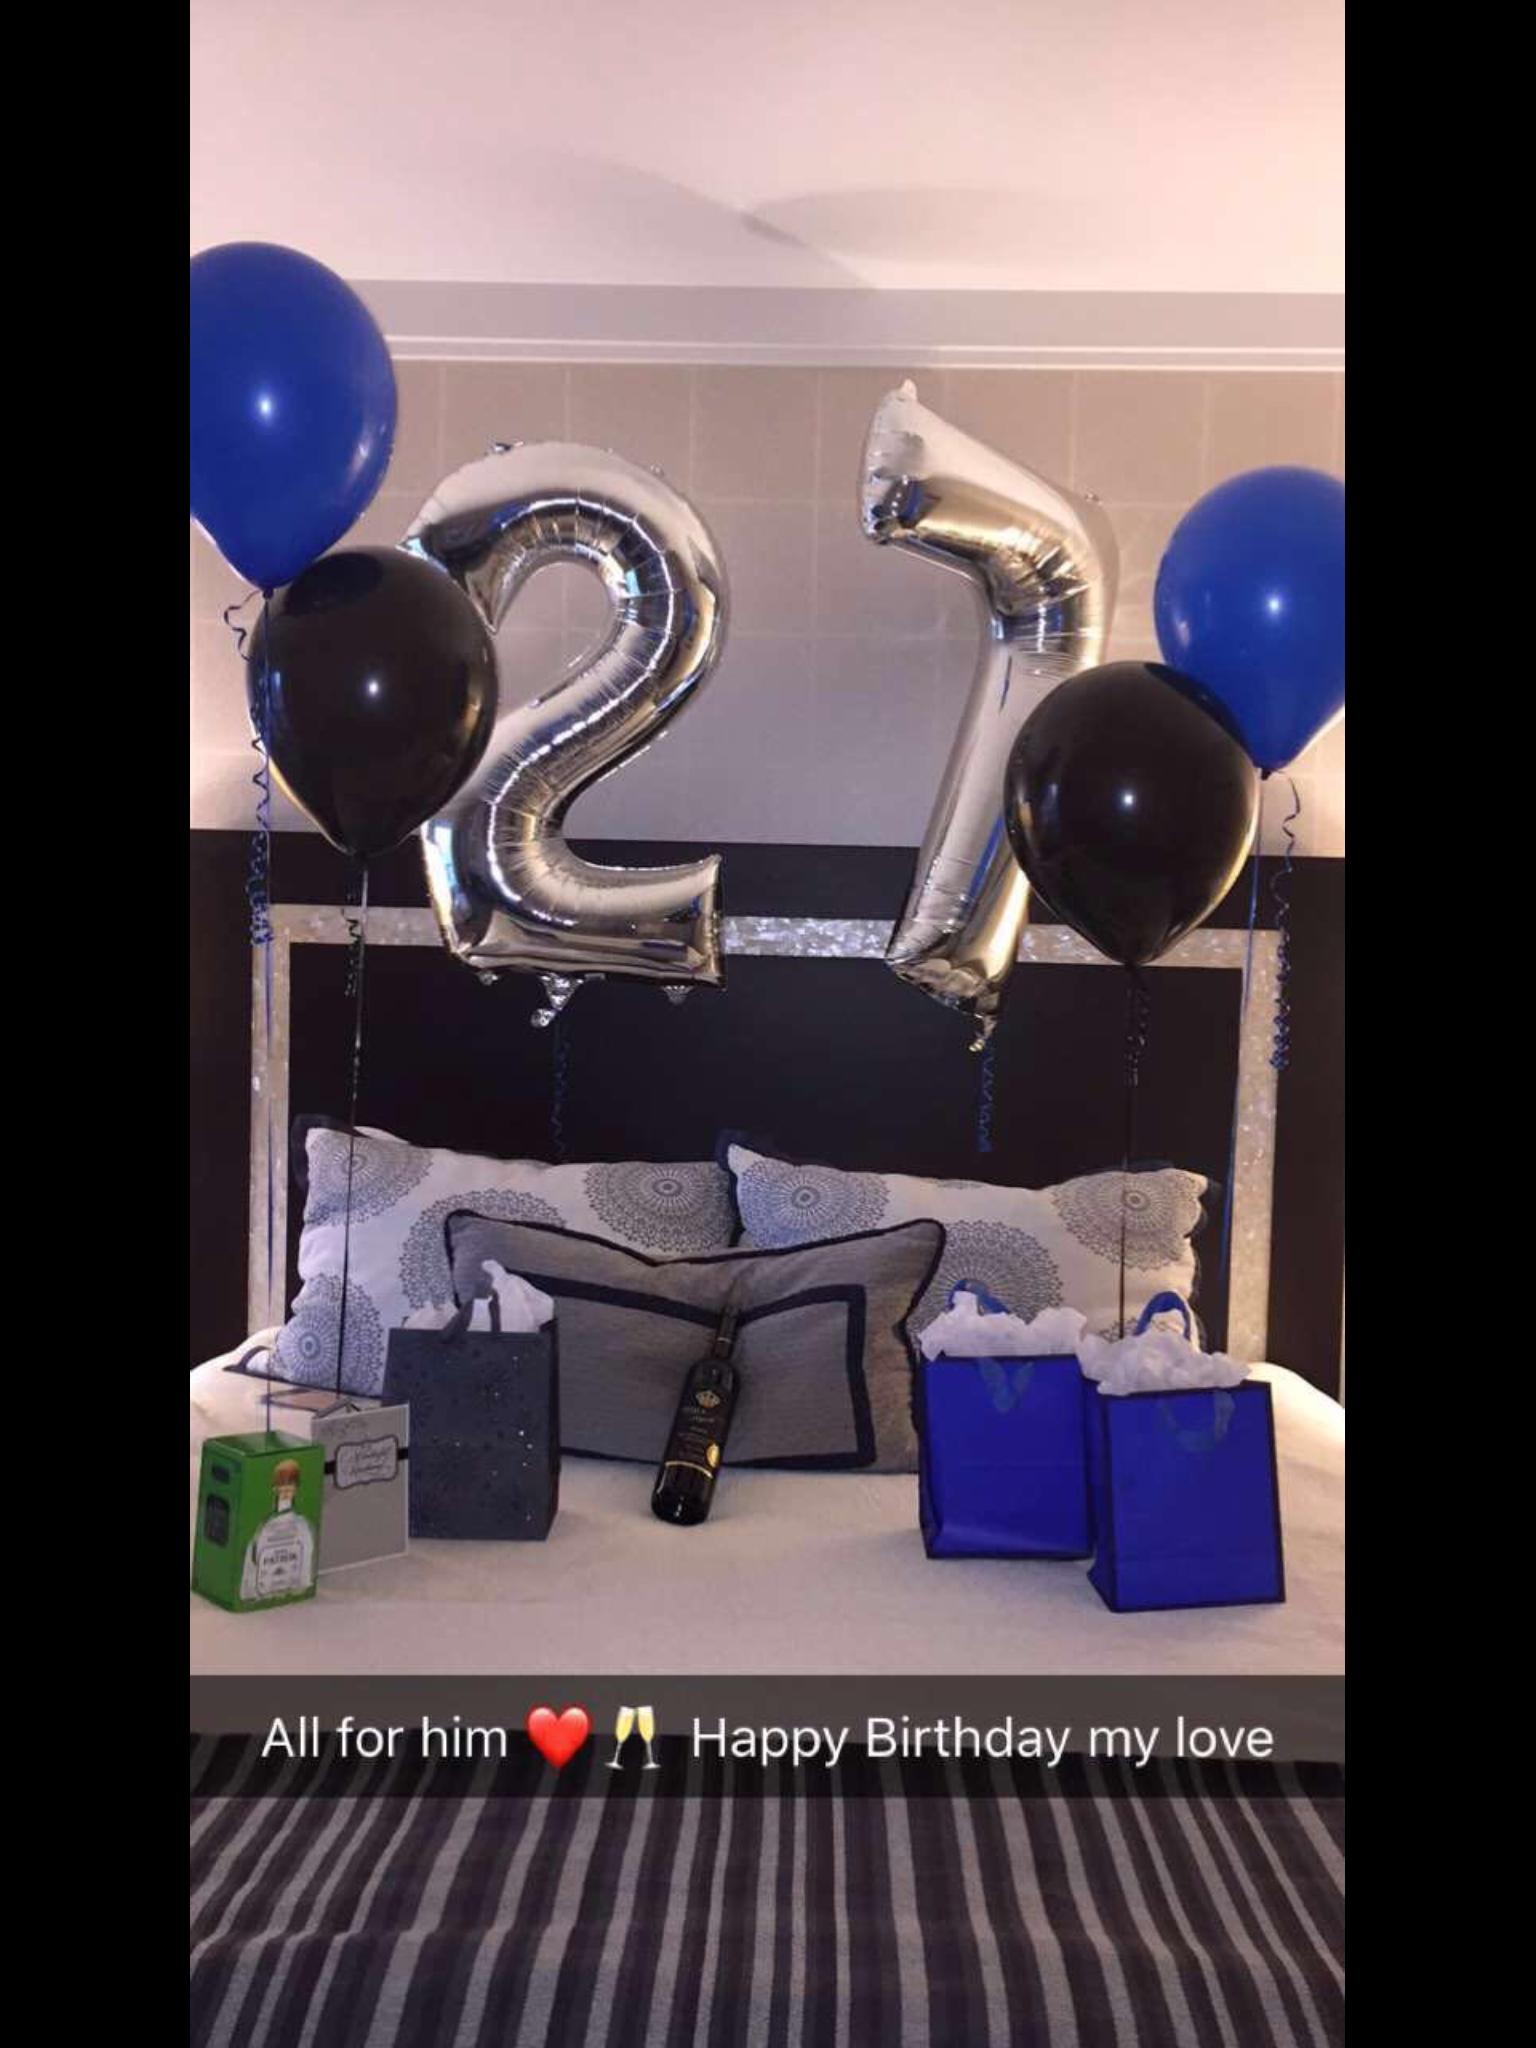 10 Fantastic Surprise Party Ideas For A Man birthday surprise for him e29da4 boyfriends pinterest jay 3 2020